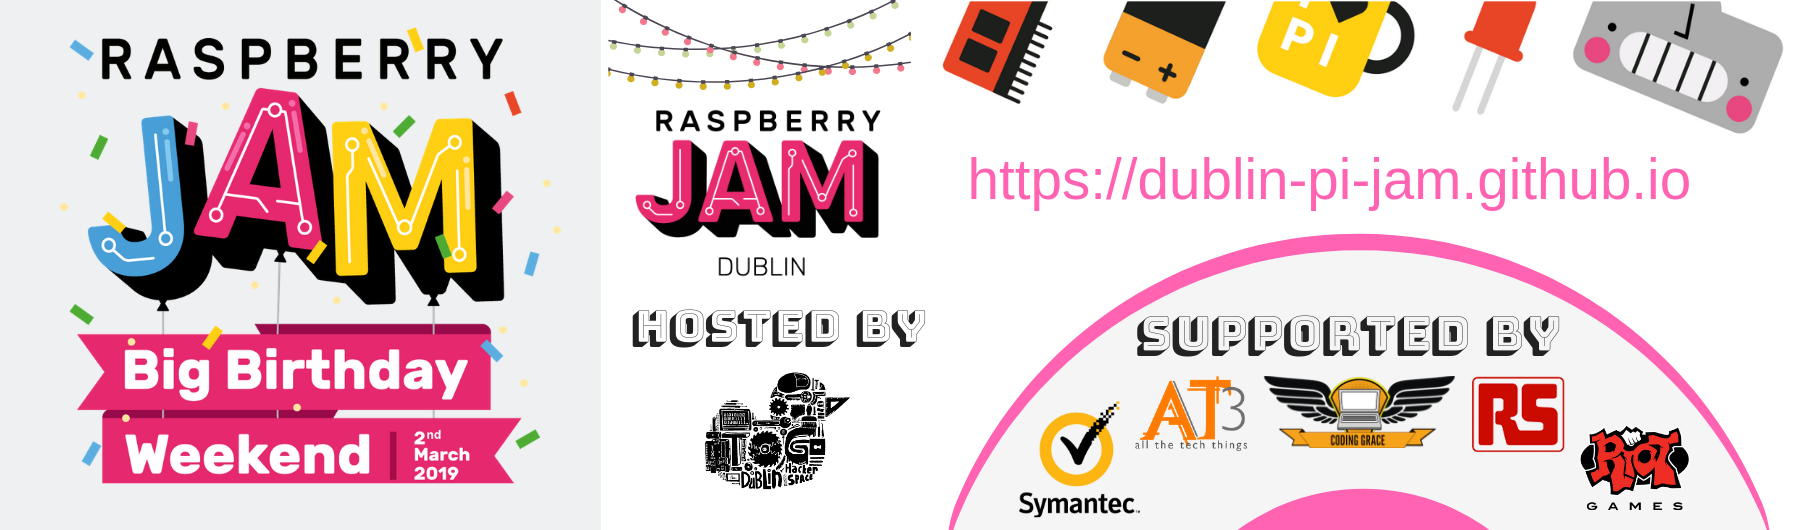 Raspberry Jam Big Birthday Event 2019